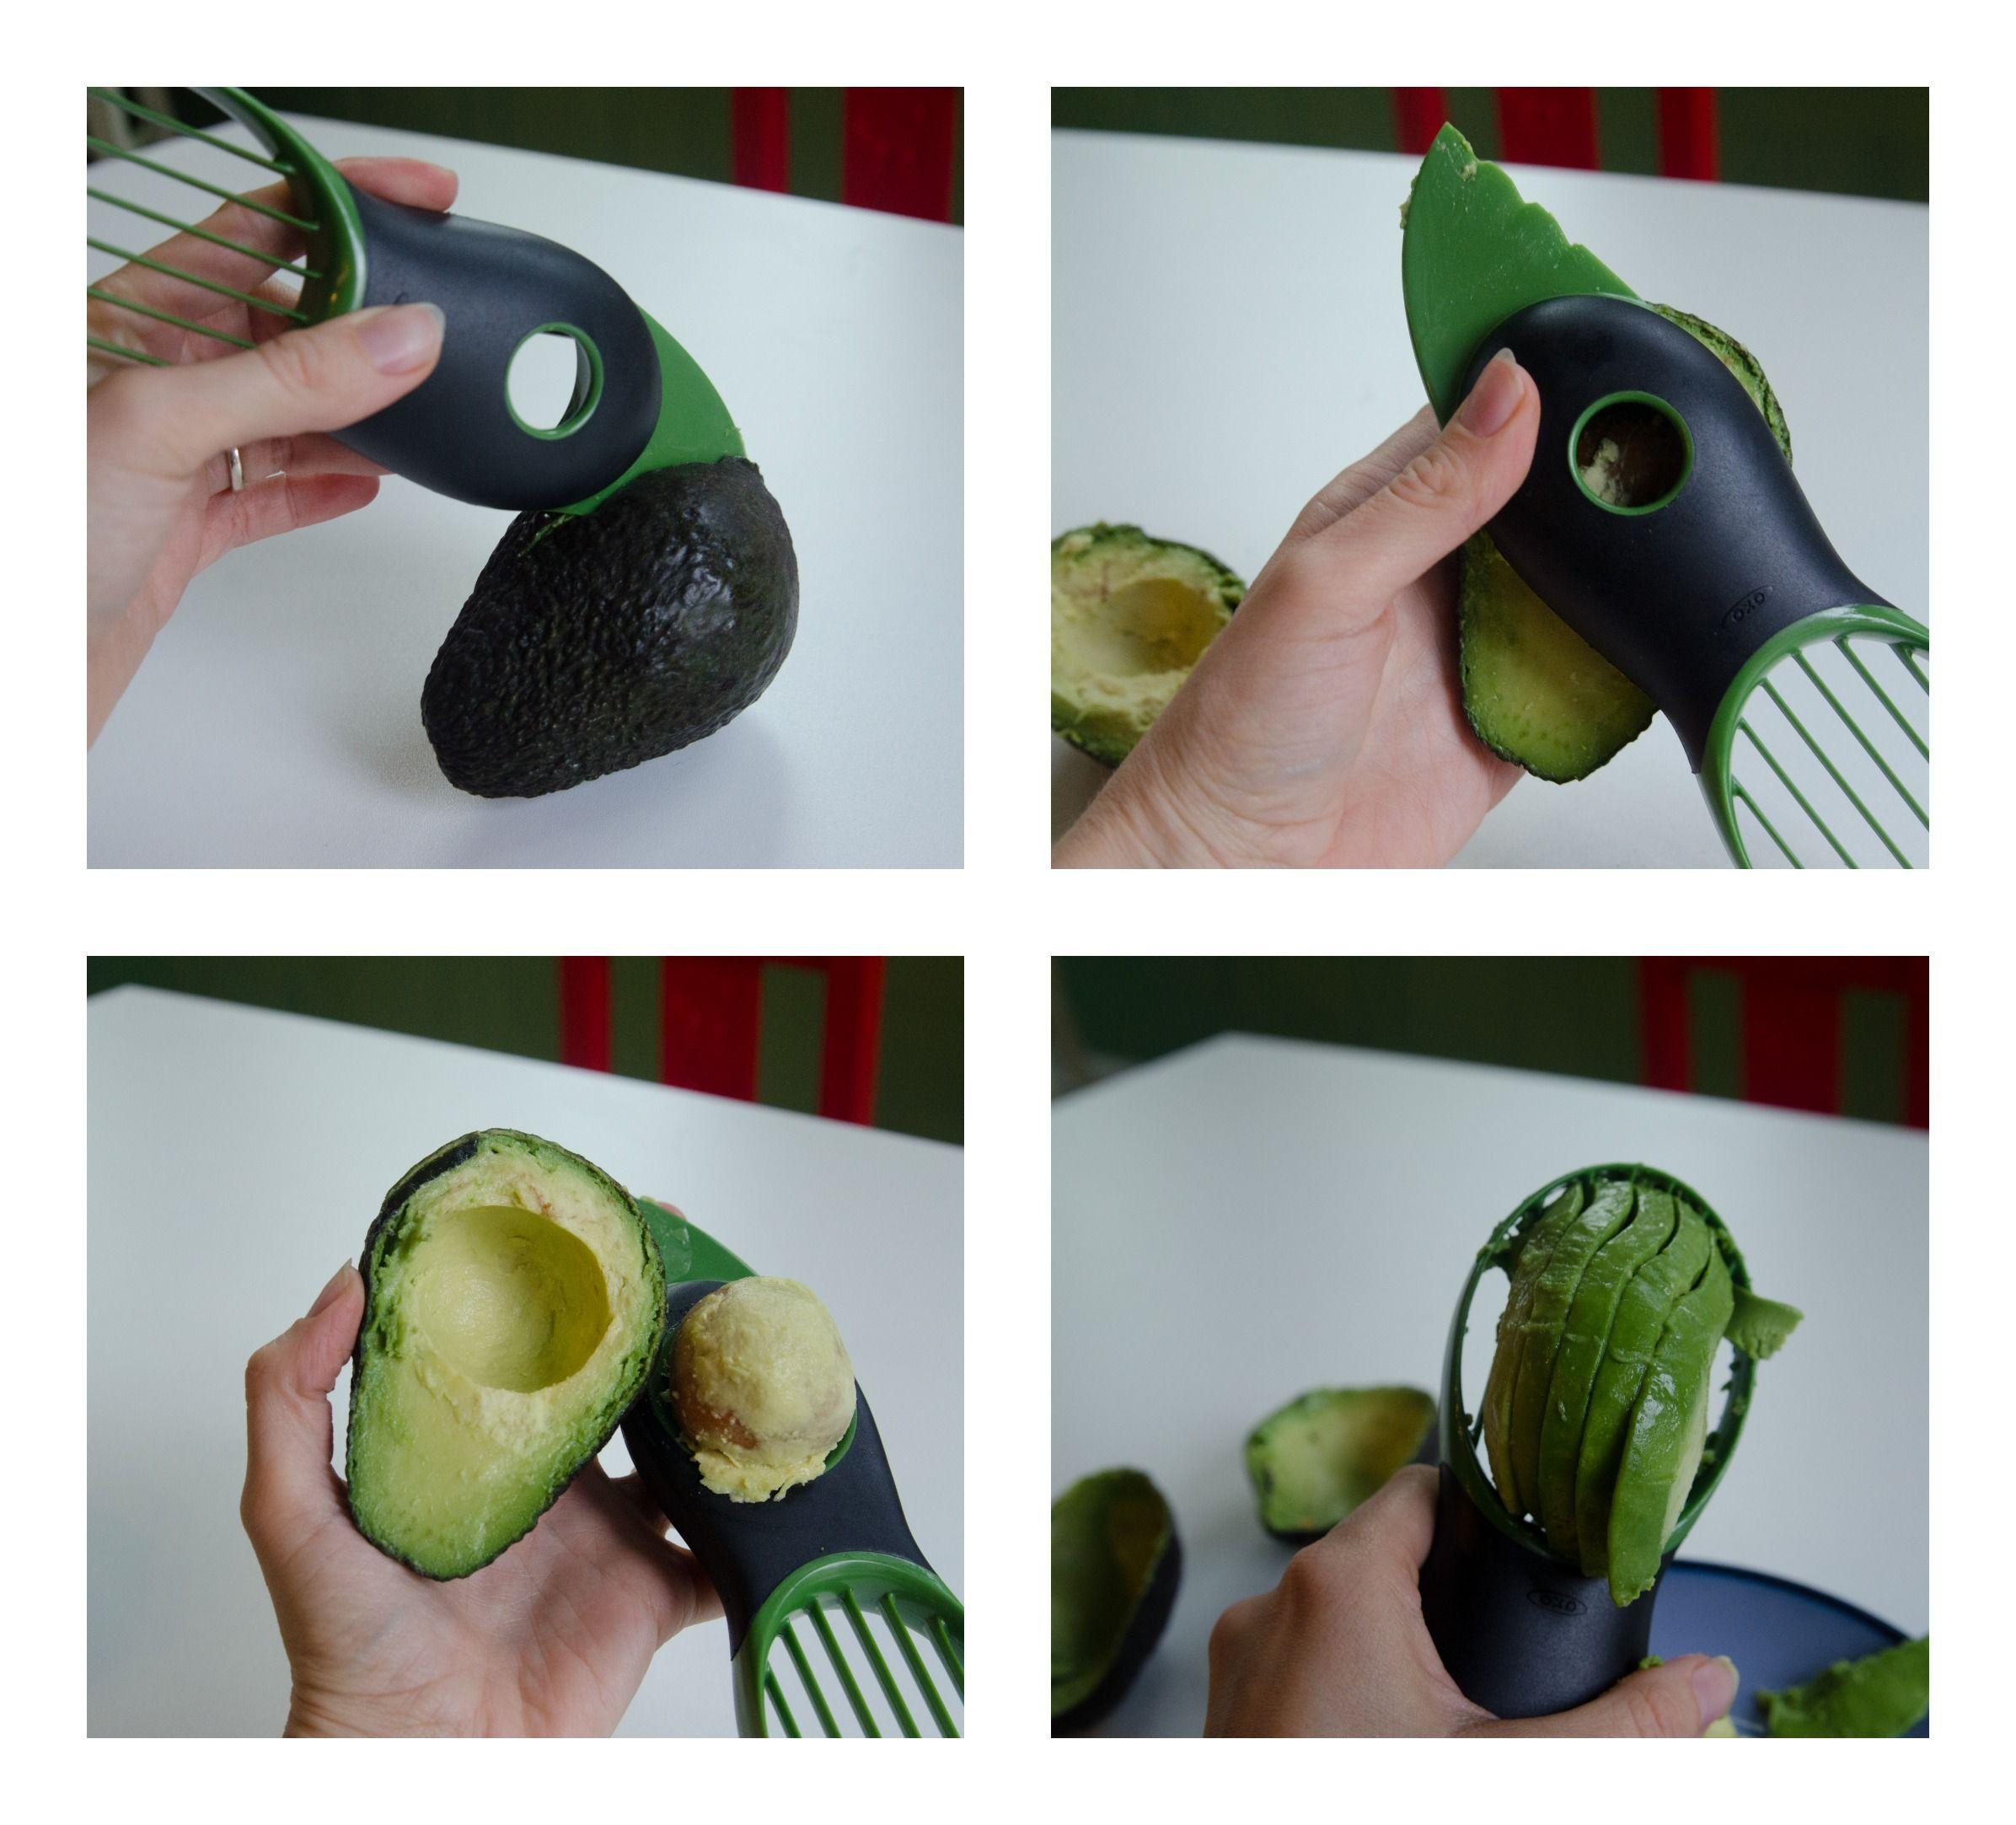 3 in 1 Avocado Tool | Unique Kitchen Tools | Pinterest | Avocado tool